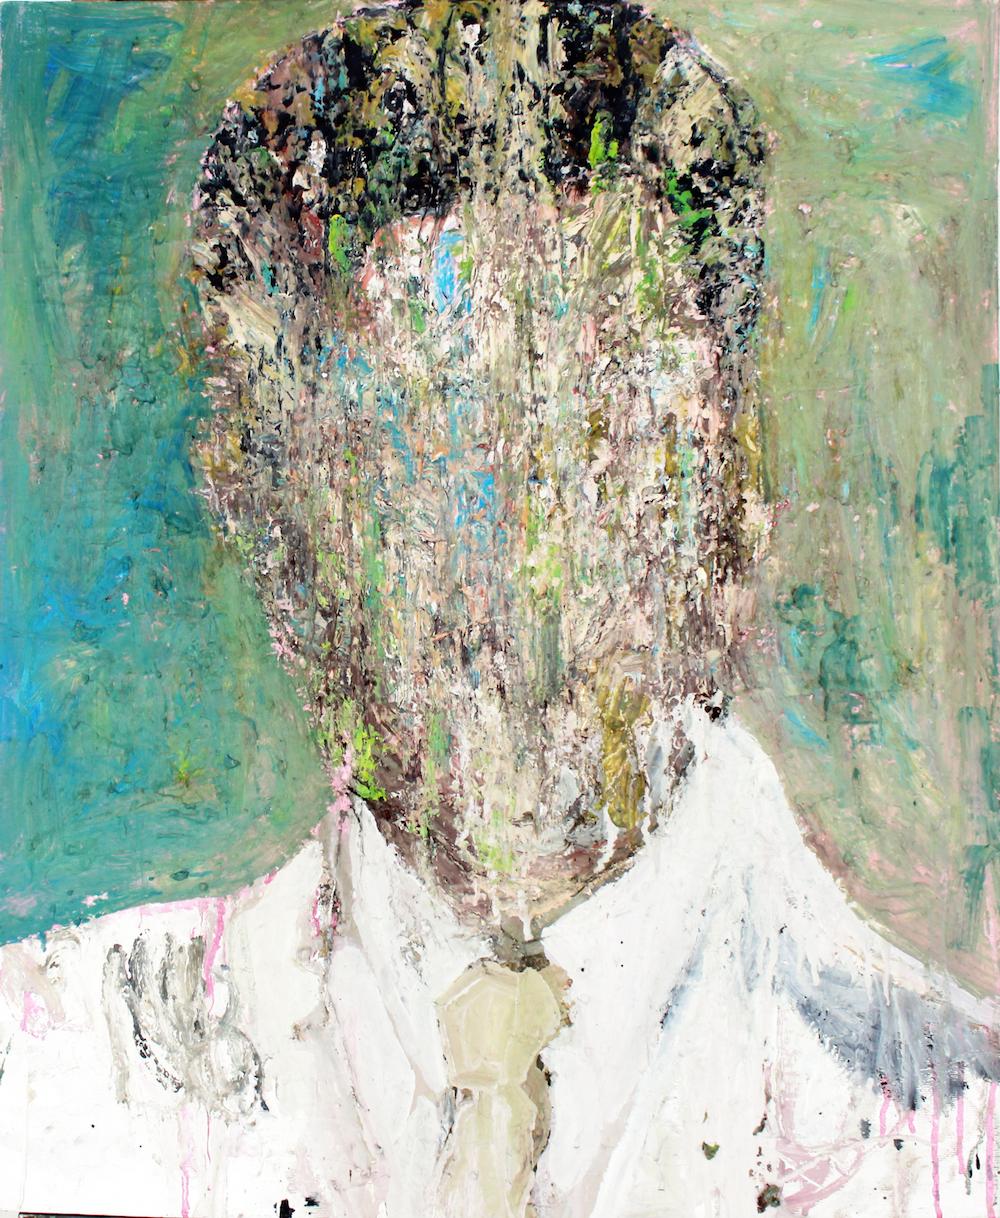 Maya Muñoz, 'Andrew, American Dream', 2018, oil on canvas, 76 x 64cm. Image courtesy of the artist and Yavuz Gallery.